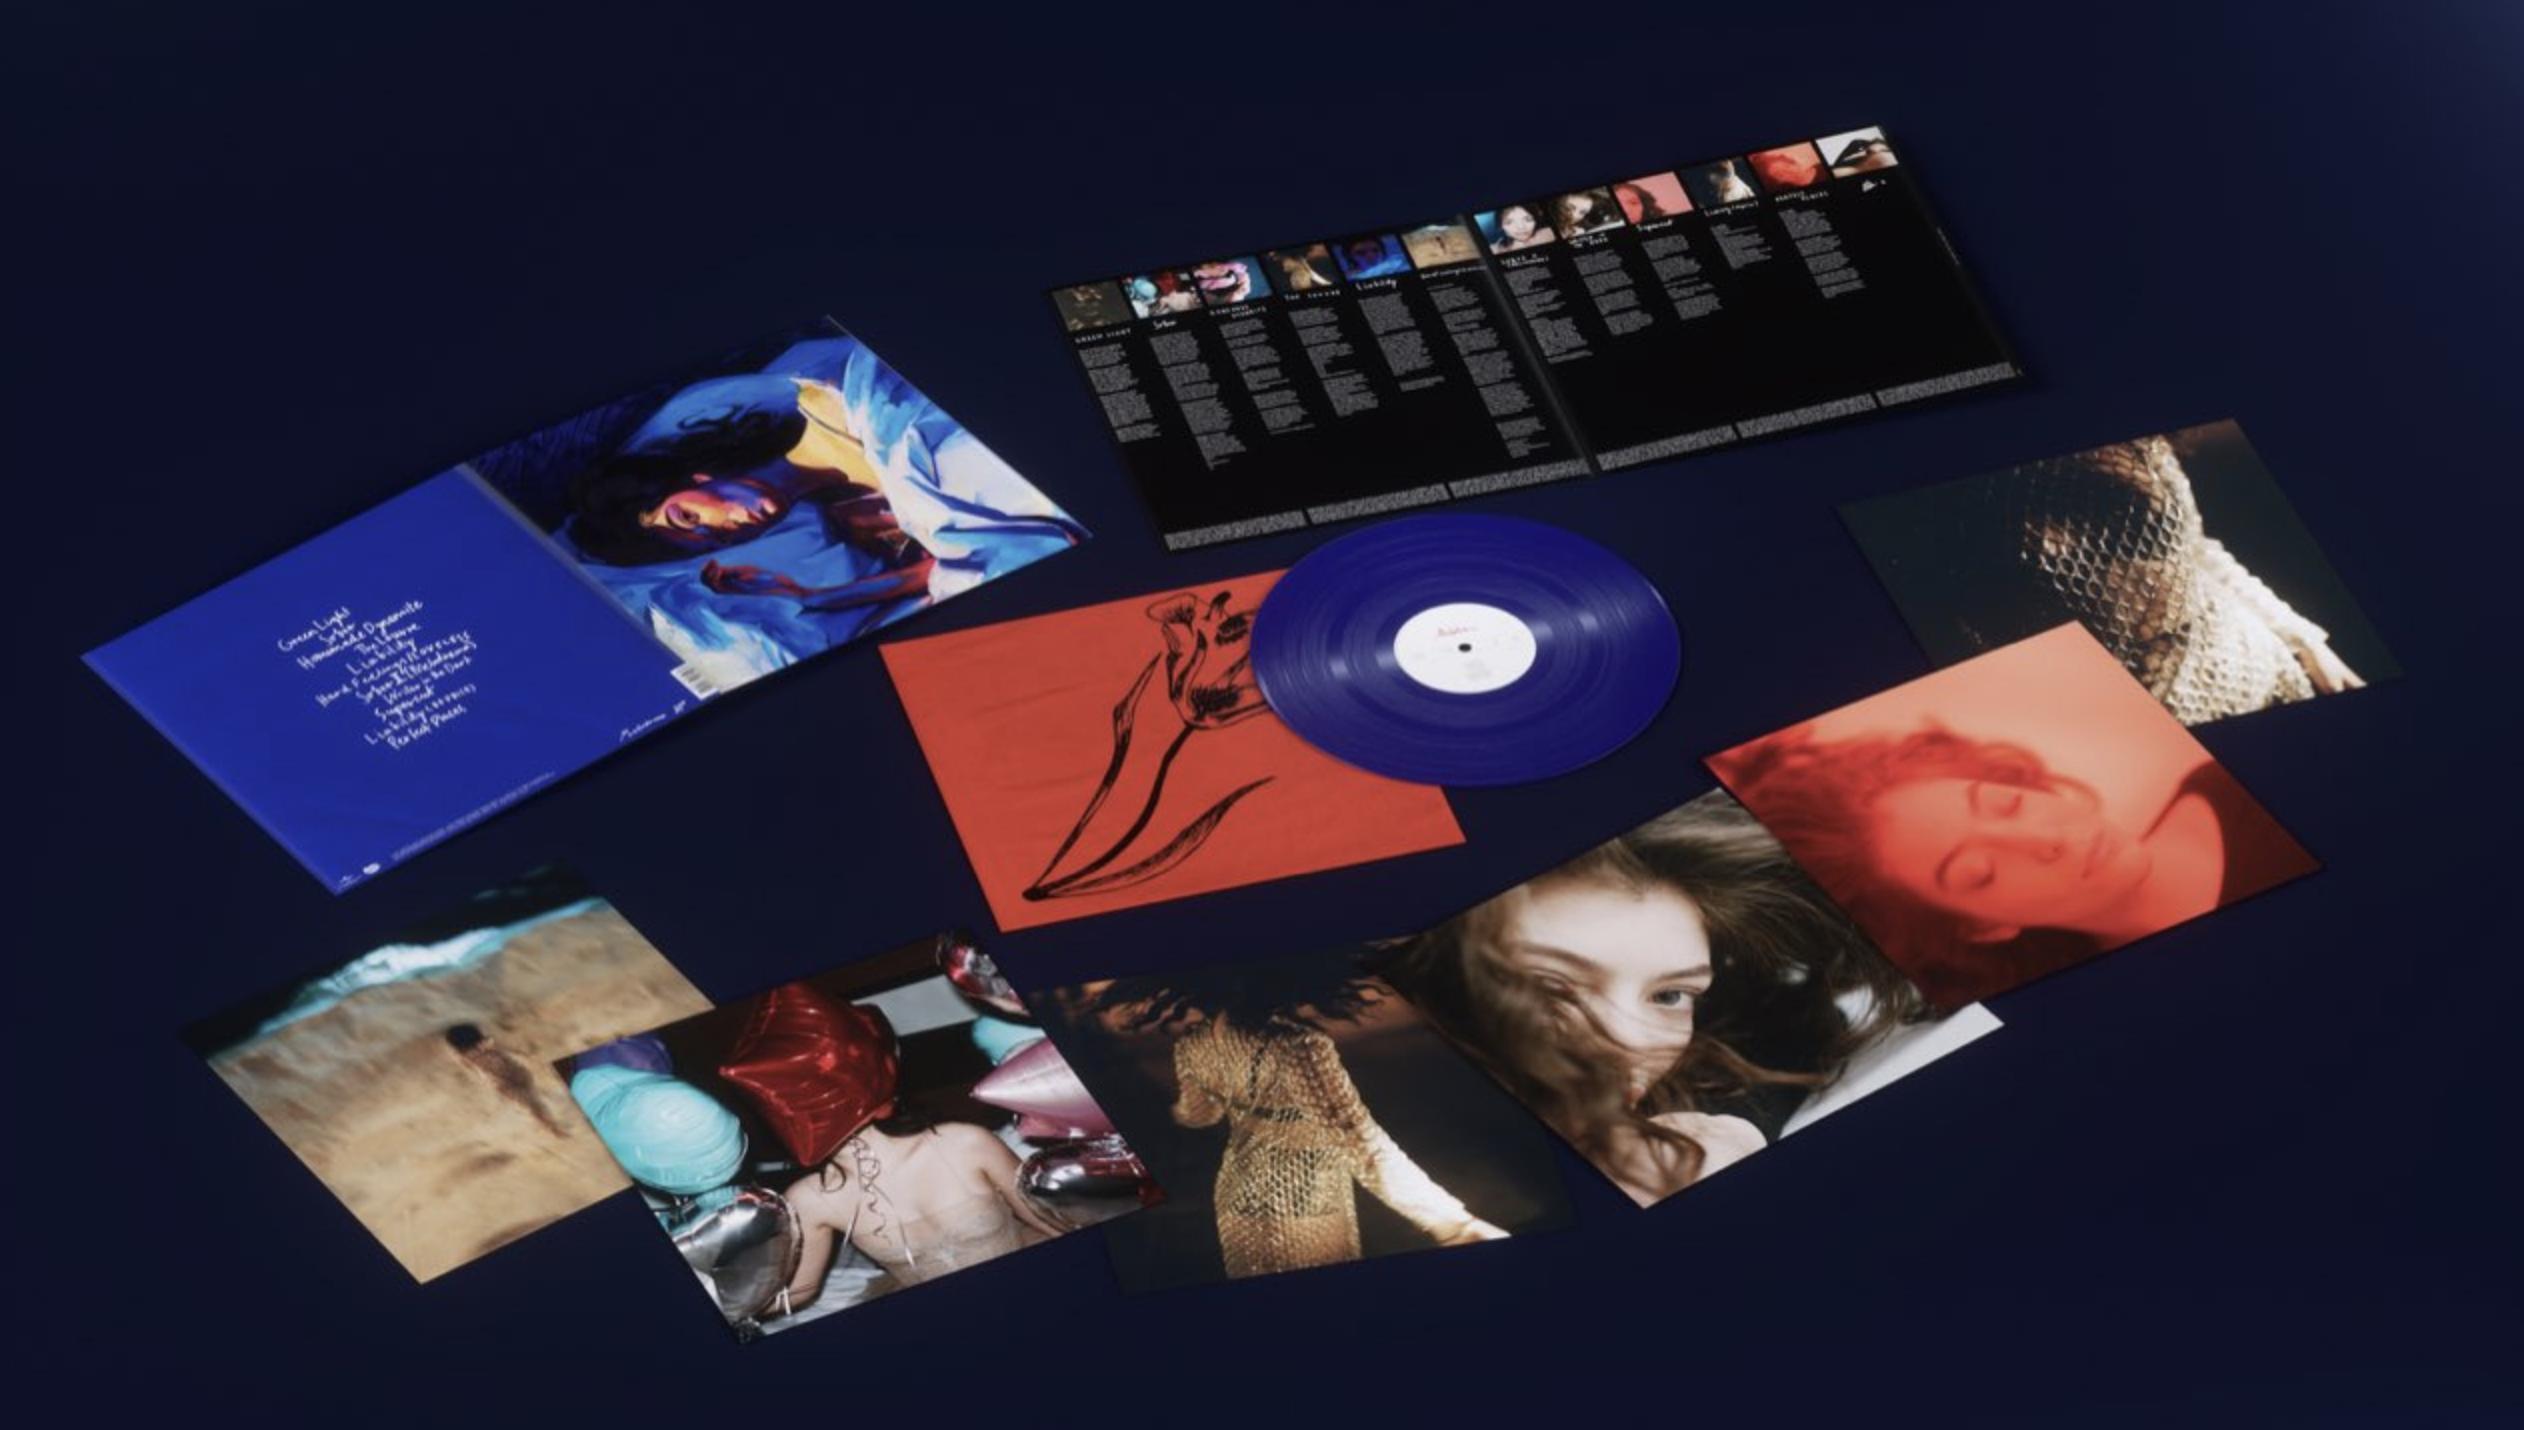 Lorde melodrama deluxe packshot